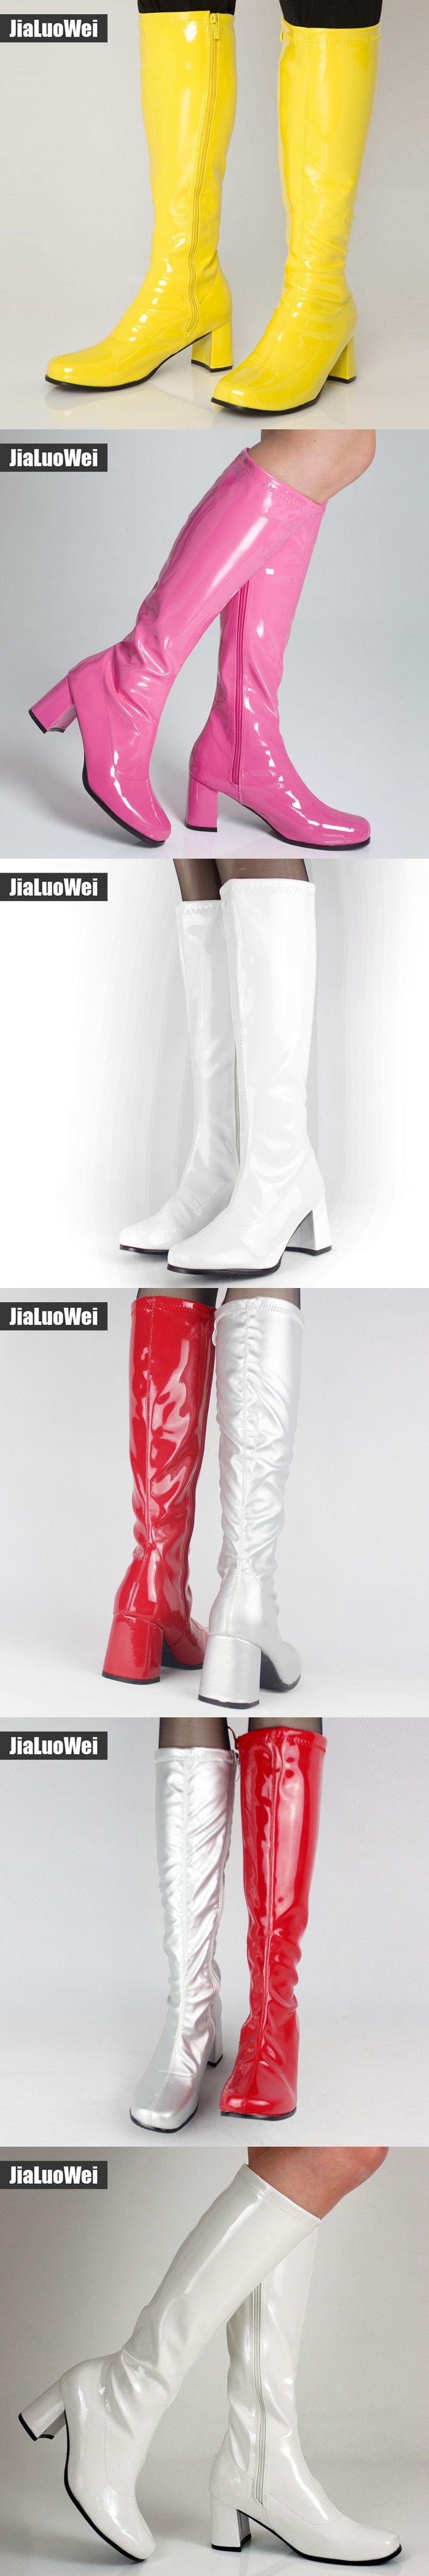 1ea5d93c0eb halloween costumes White 1960s Go Go Ladies Retro Boots For Women Knee High  Boots 60s 70s Fancy Dress Party Plus size